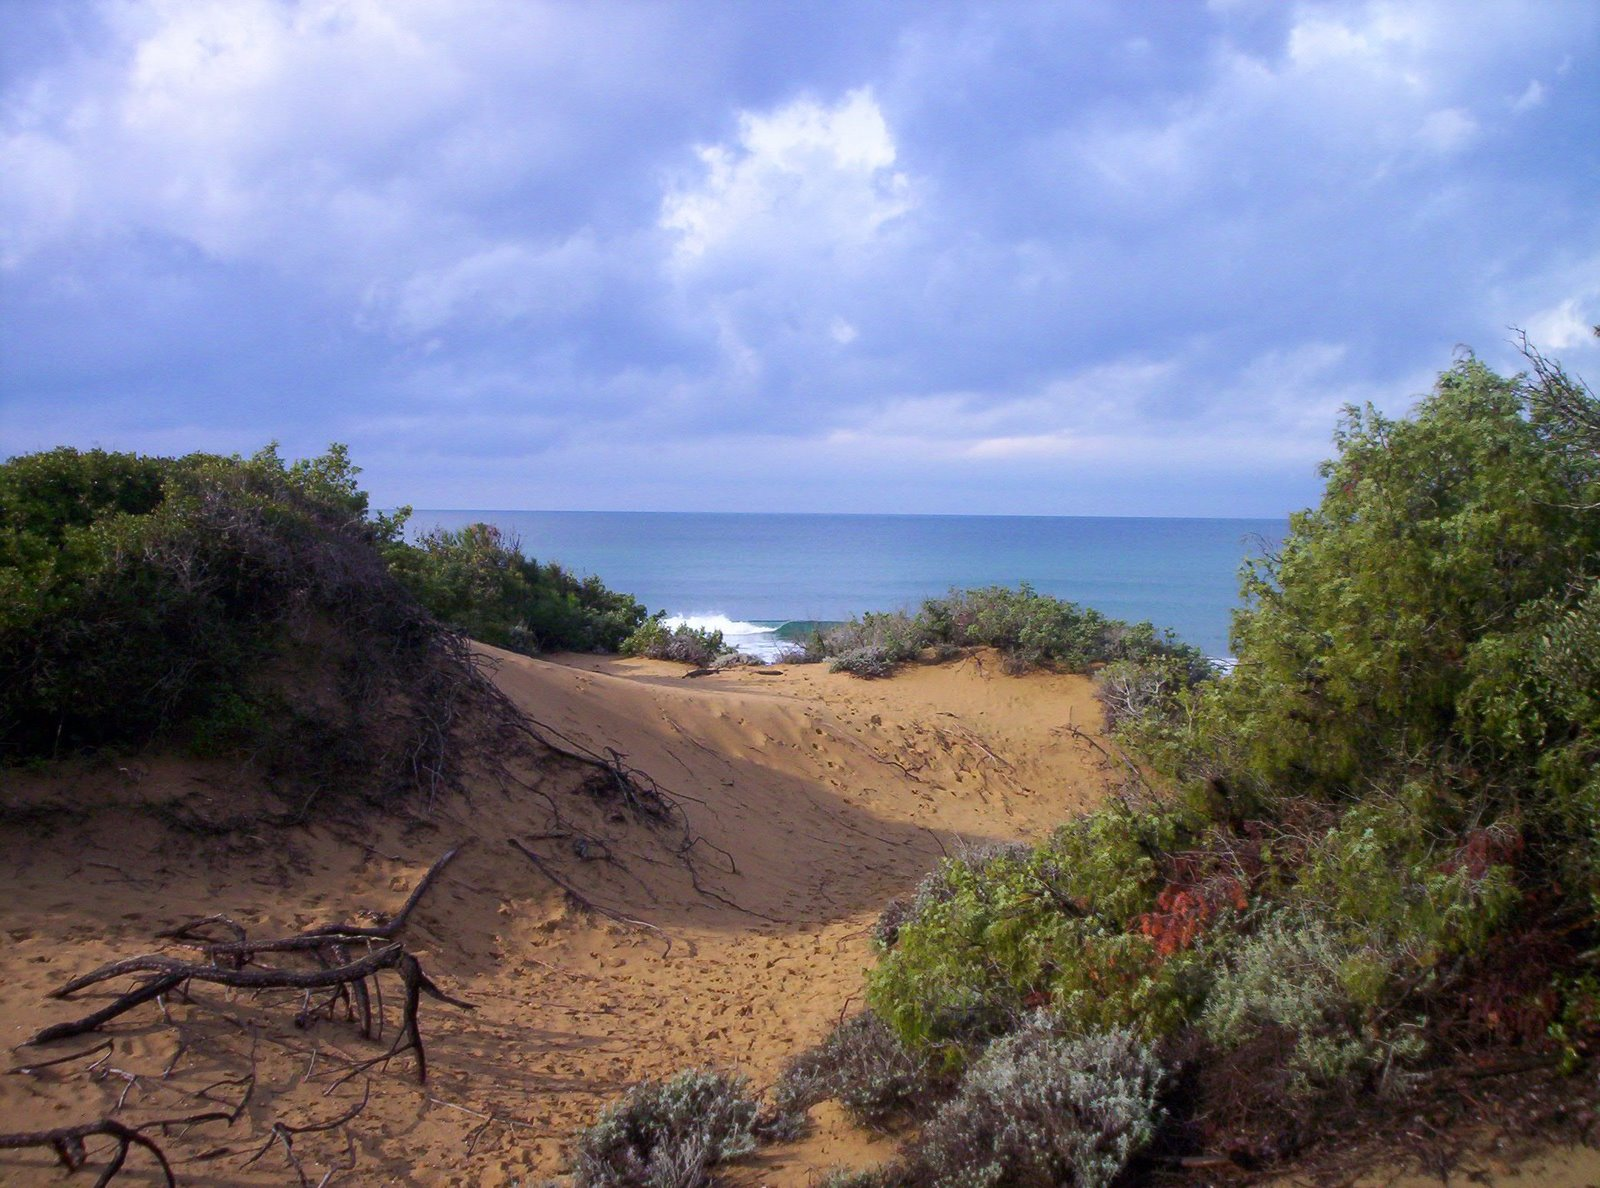 estate nei parchi 2015 parchi e aree protette ambiente